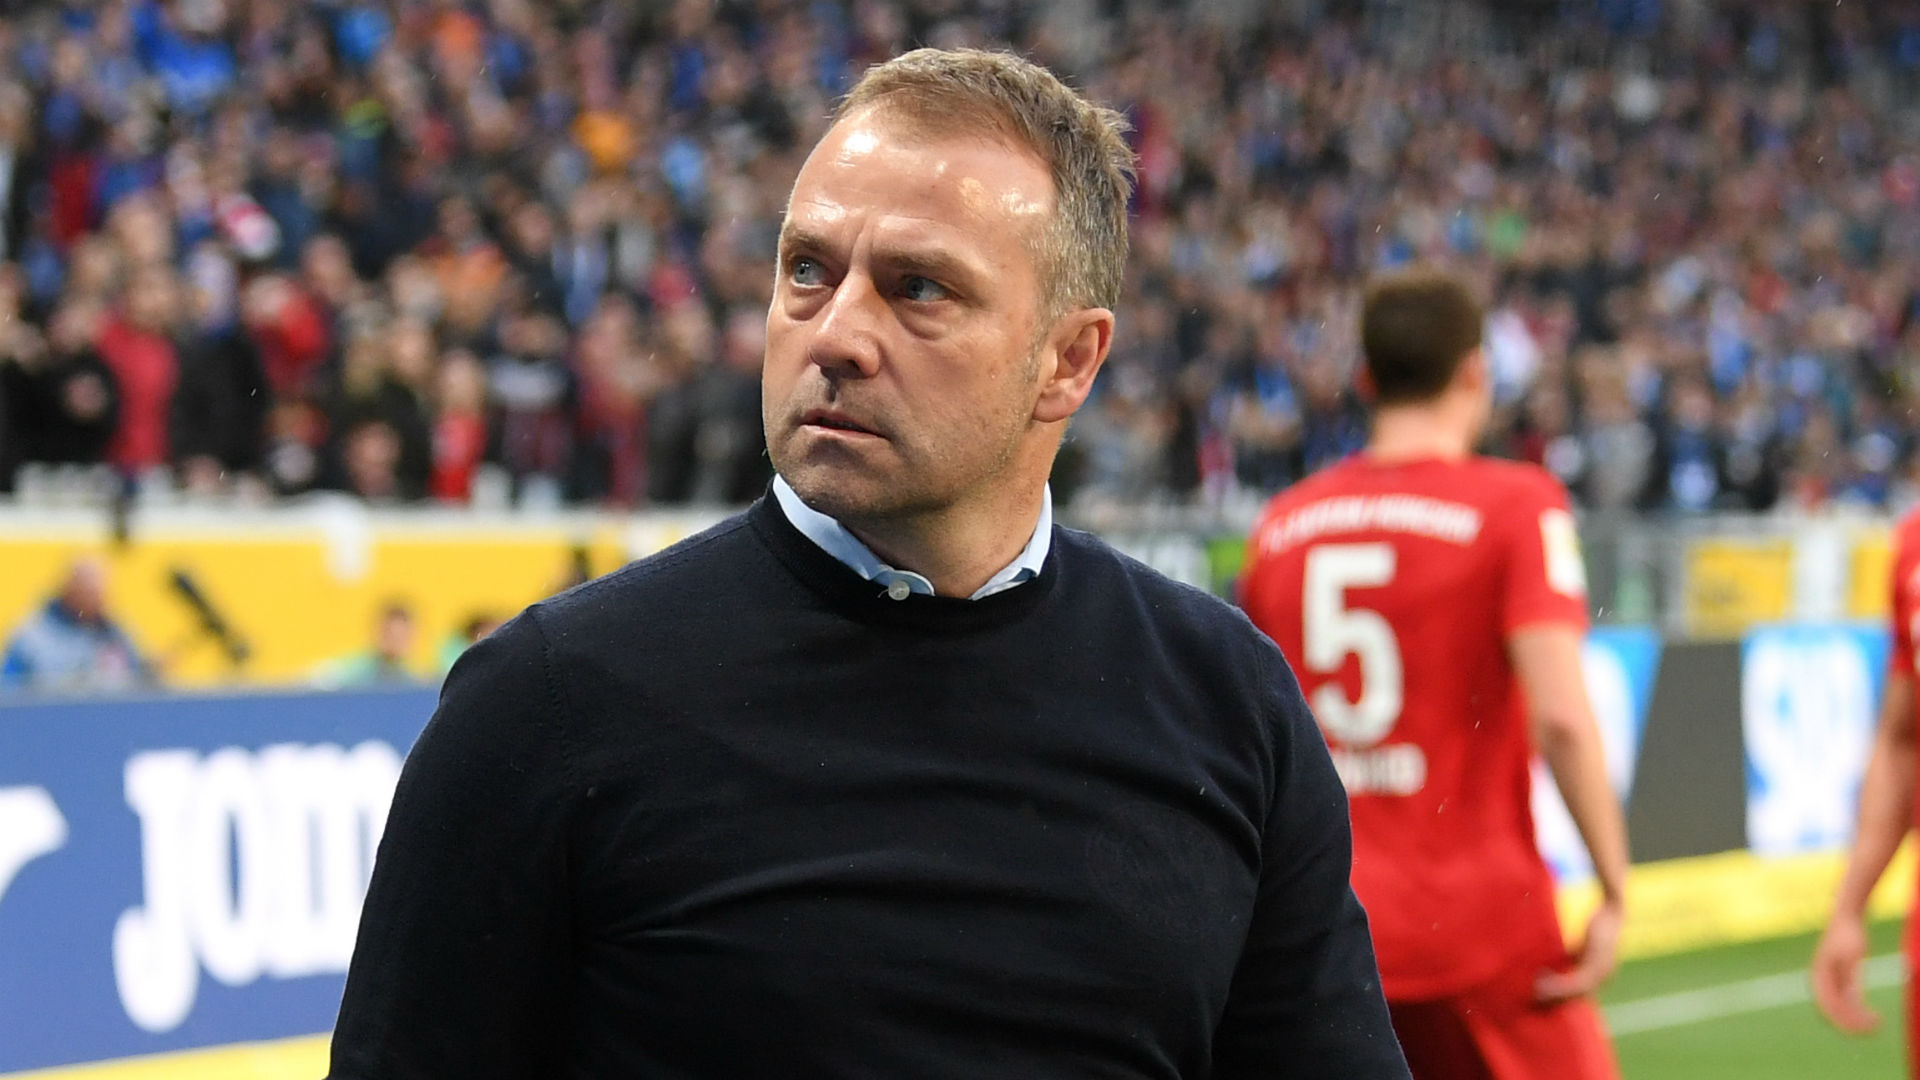 Bayern focused on Pokal final, not Sane signing